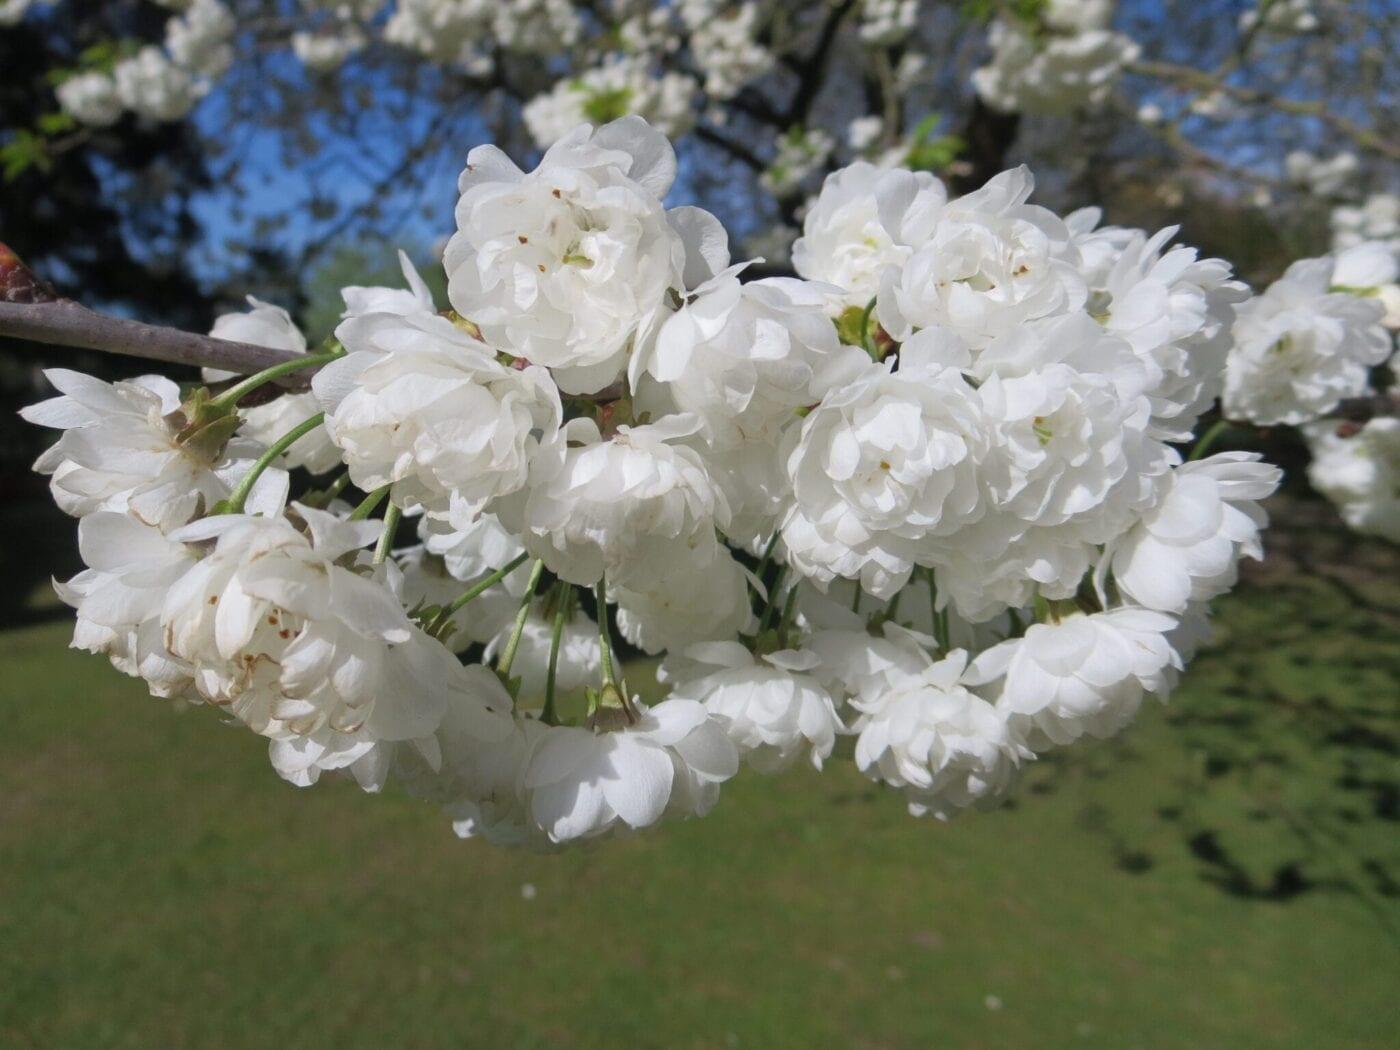 Wild Cherry cultivar 'Plena'